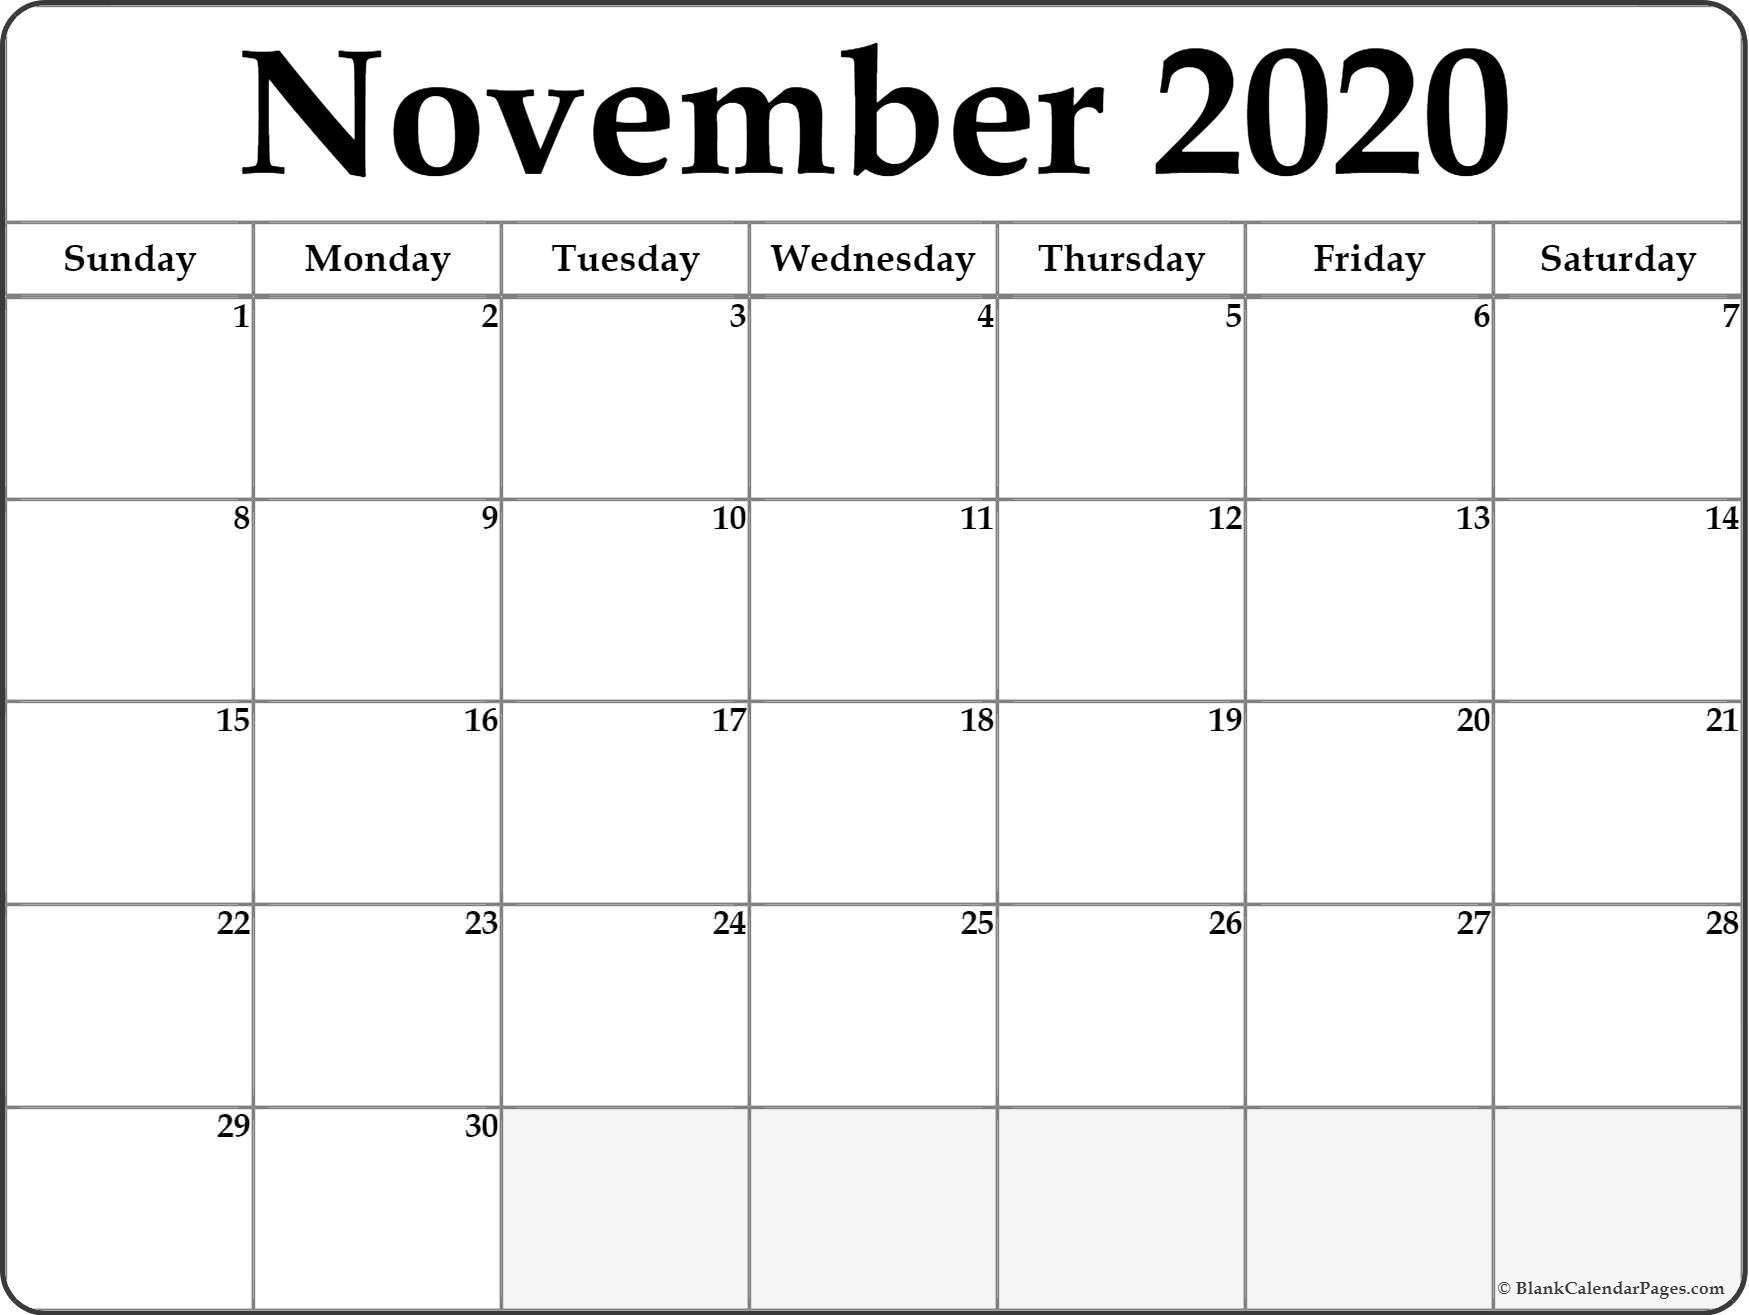 November 2020 Calendar   Free Printable Monthly Calendars  Novemner 2020 Full Page Calander Template